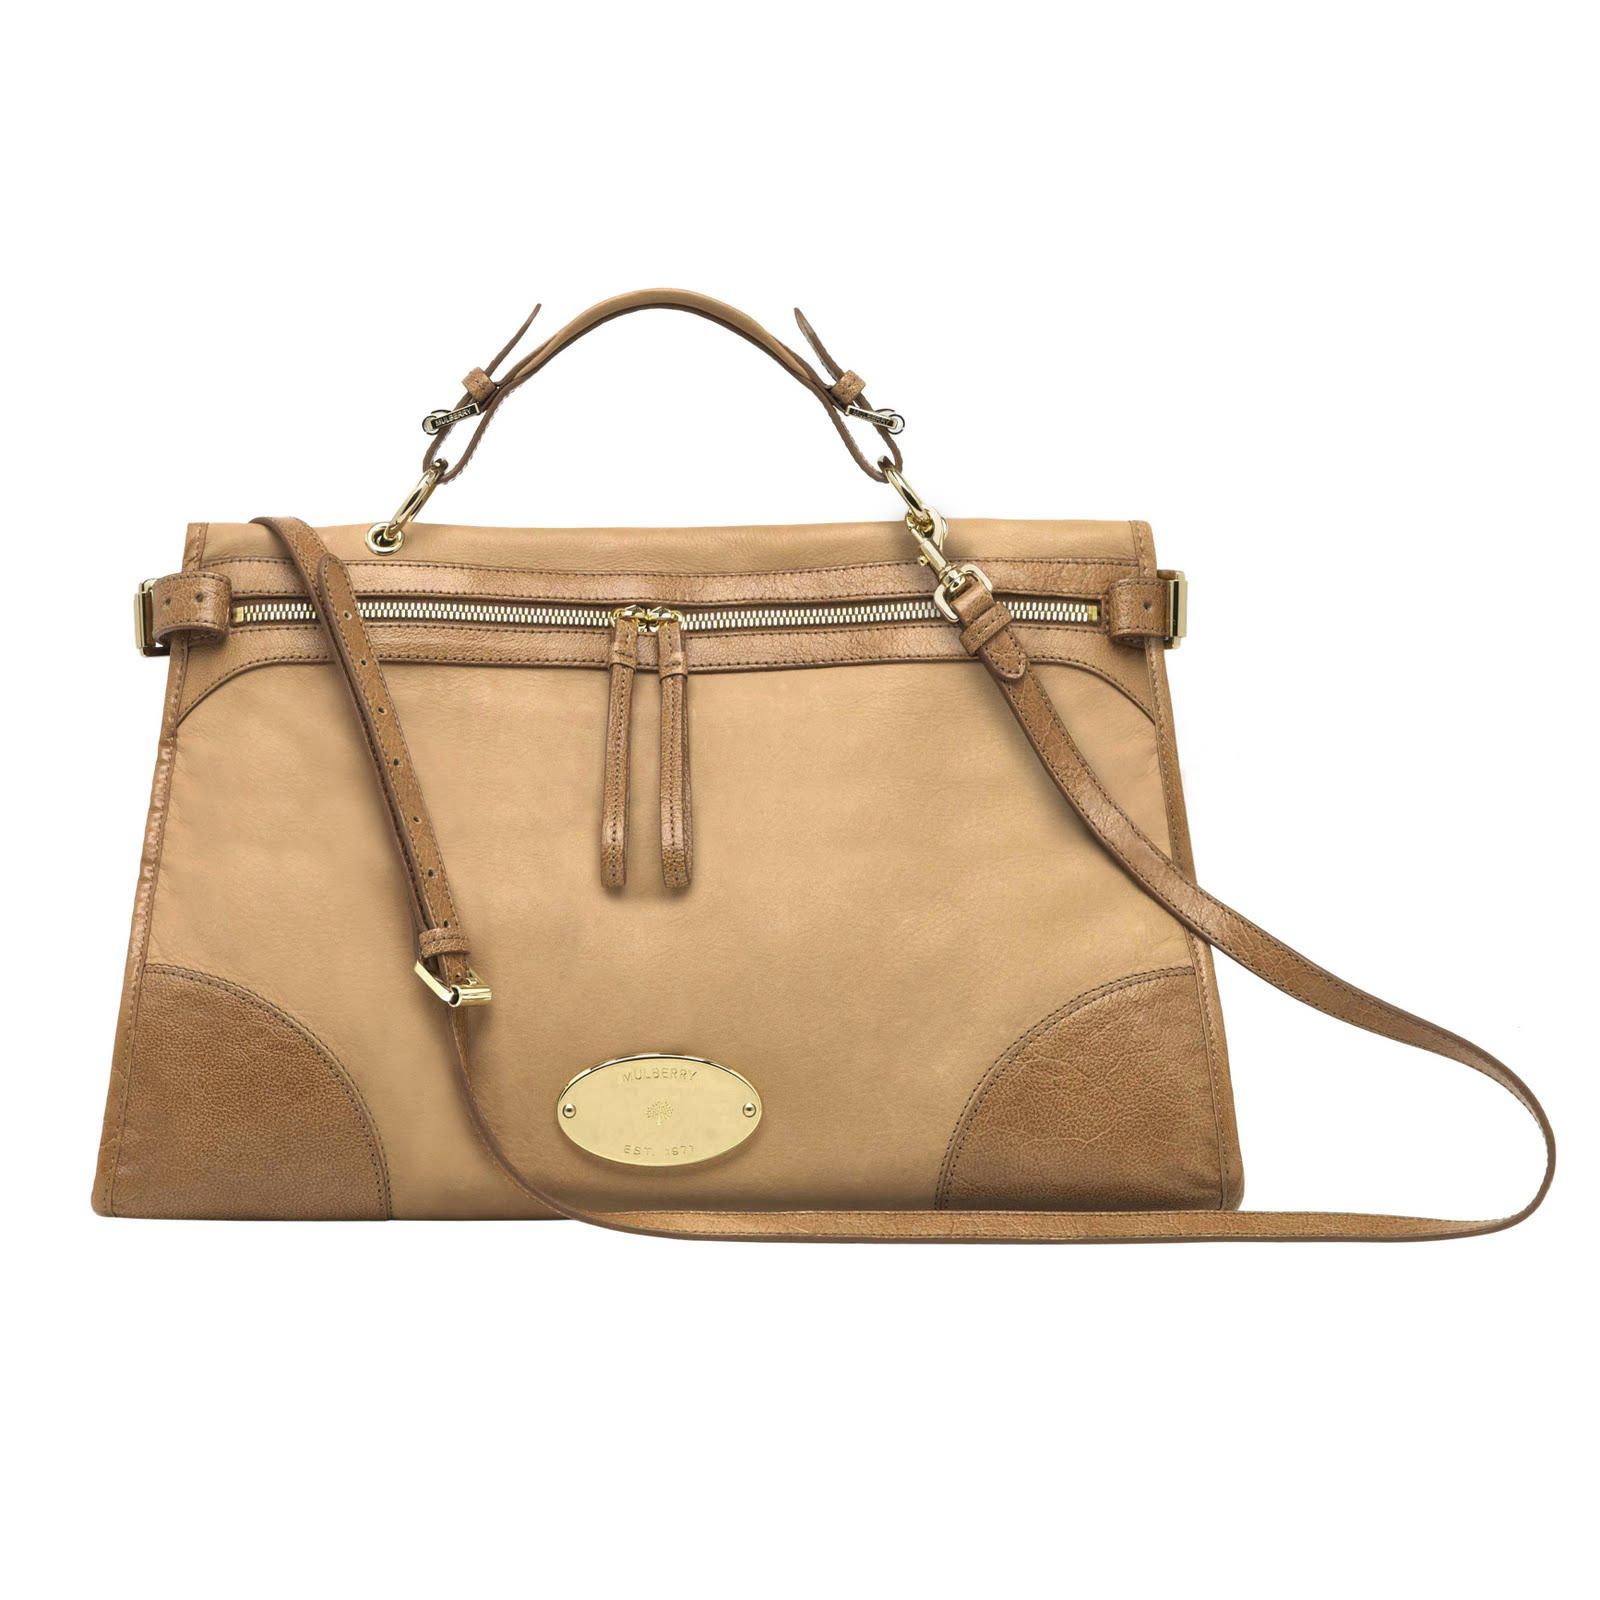 http://2.bp.blogspot.com/-EDunr0fTtyg/T_uC0vk2wkI/AAAAAAAAEjU/9VNN-5xzswE/s1600/luxury-bag.jpg